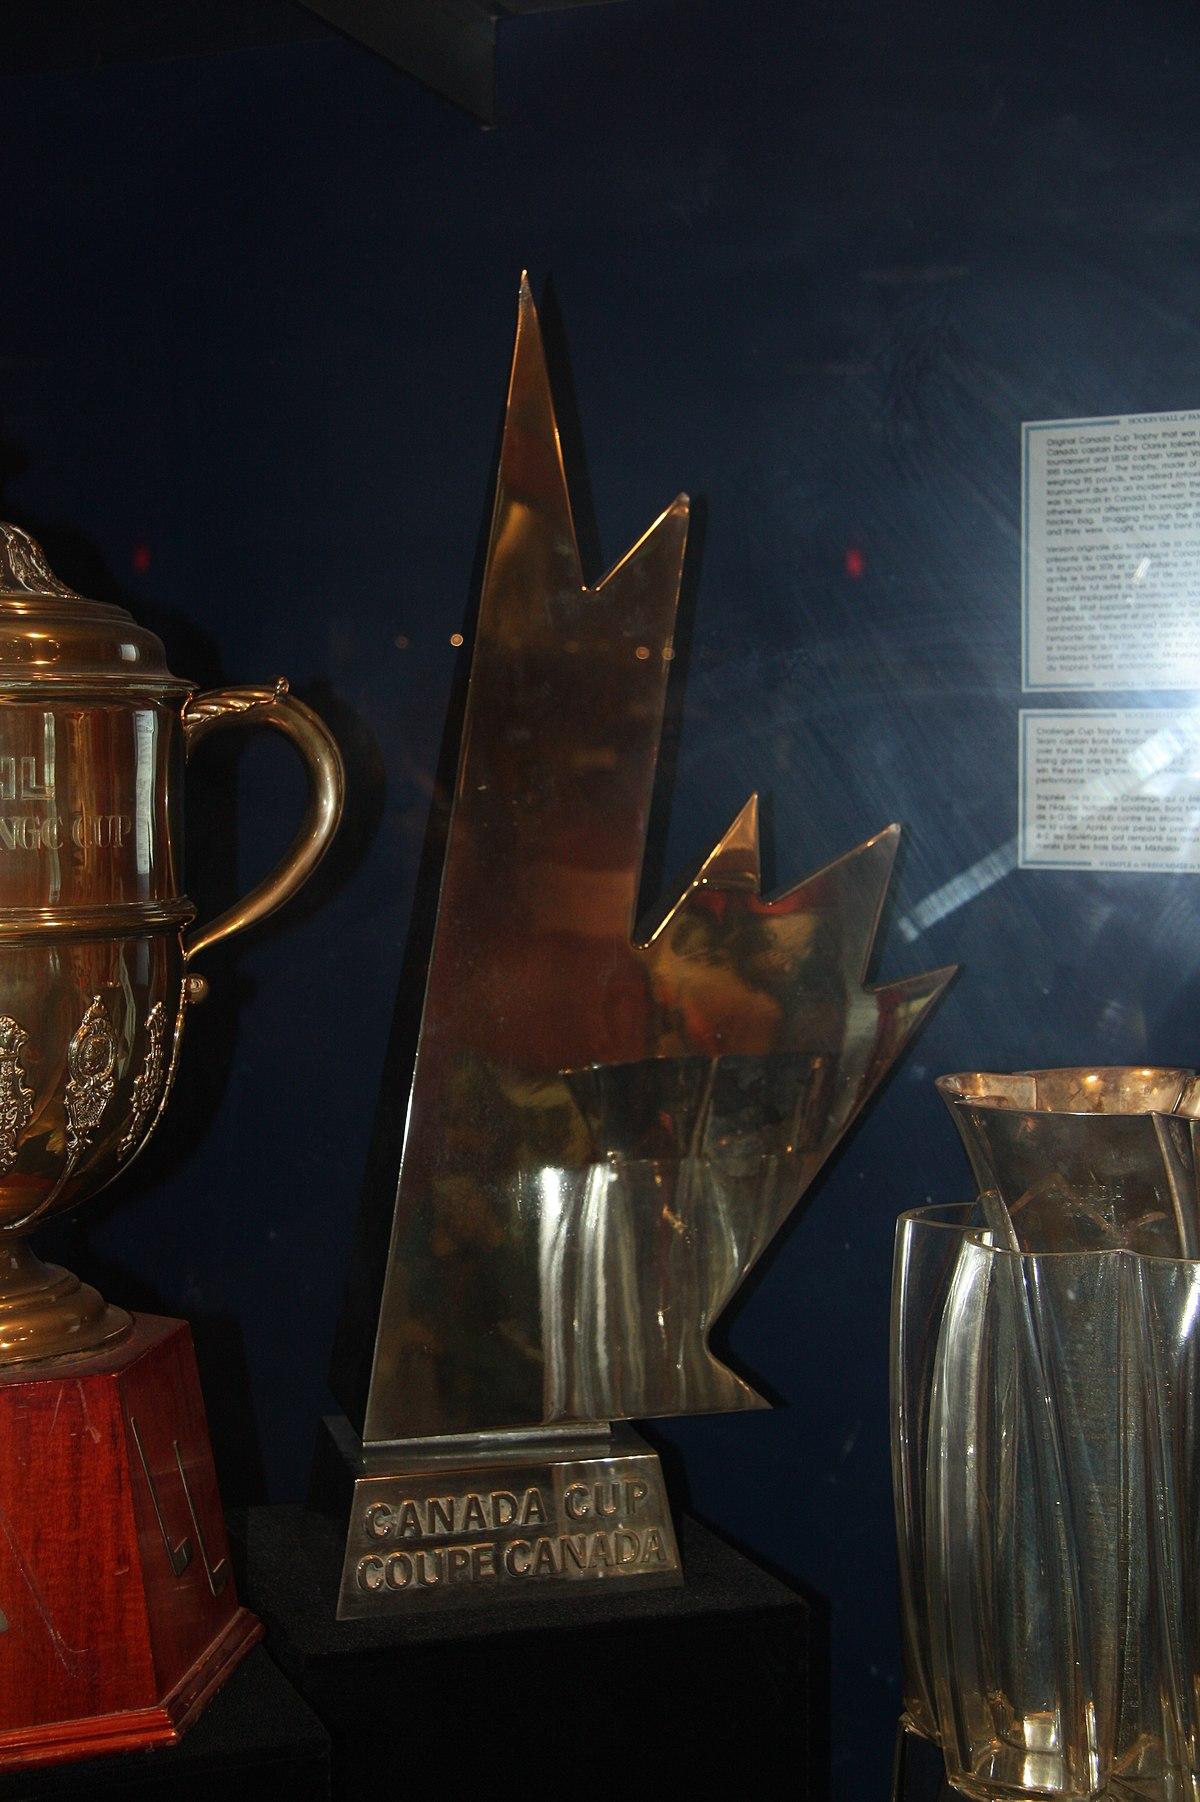 Canada Cup Wikipedia